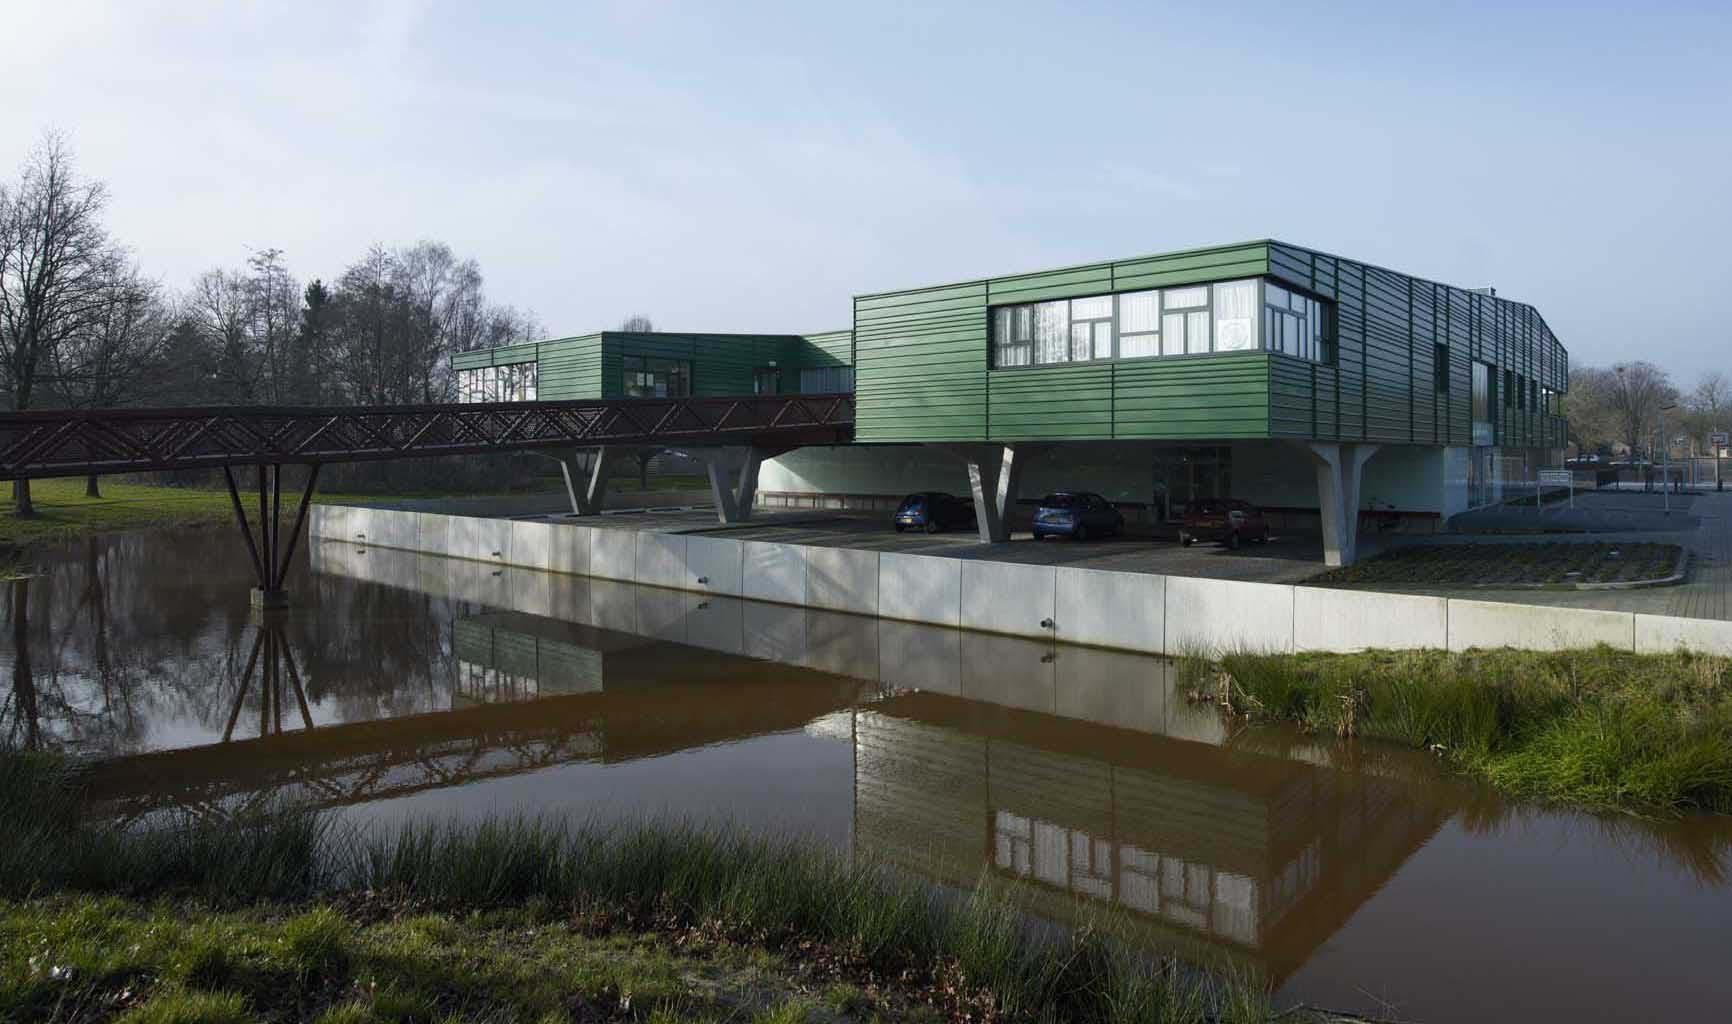 MFA Valthermond / KAW Arquitectura, © Jeroen Musch